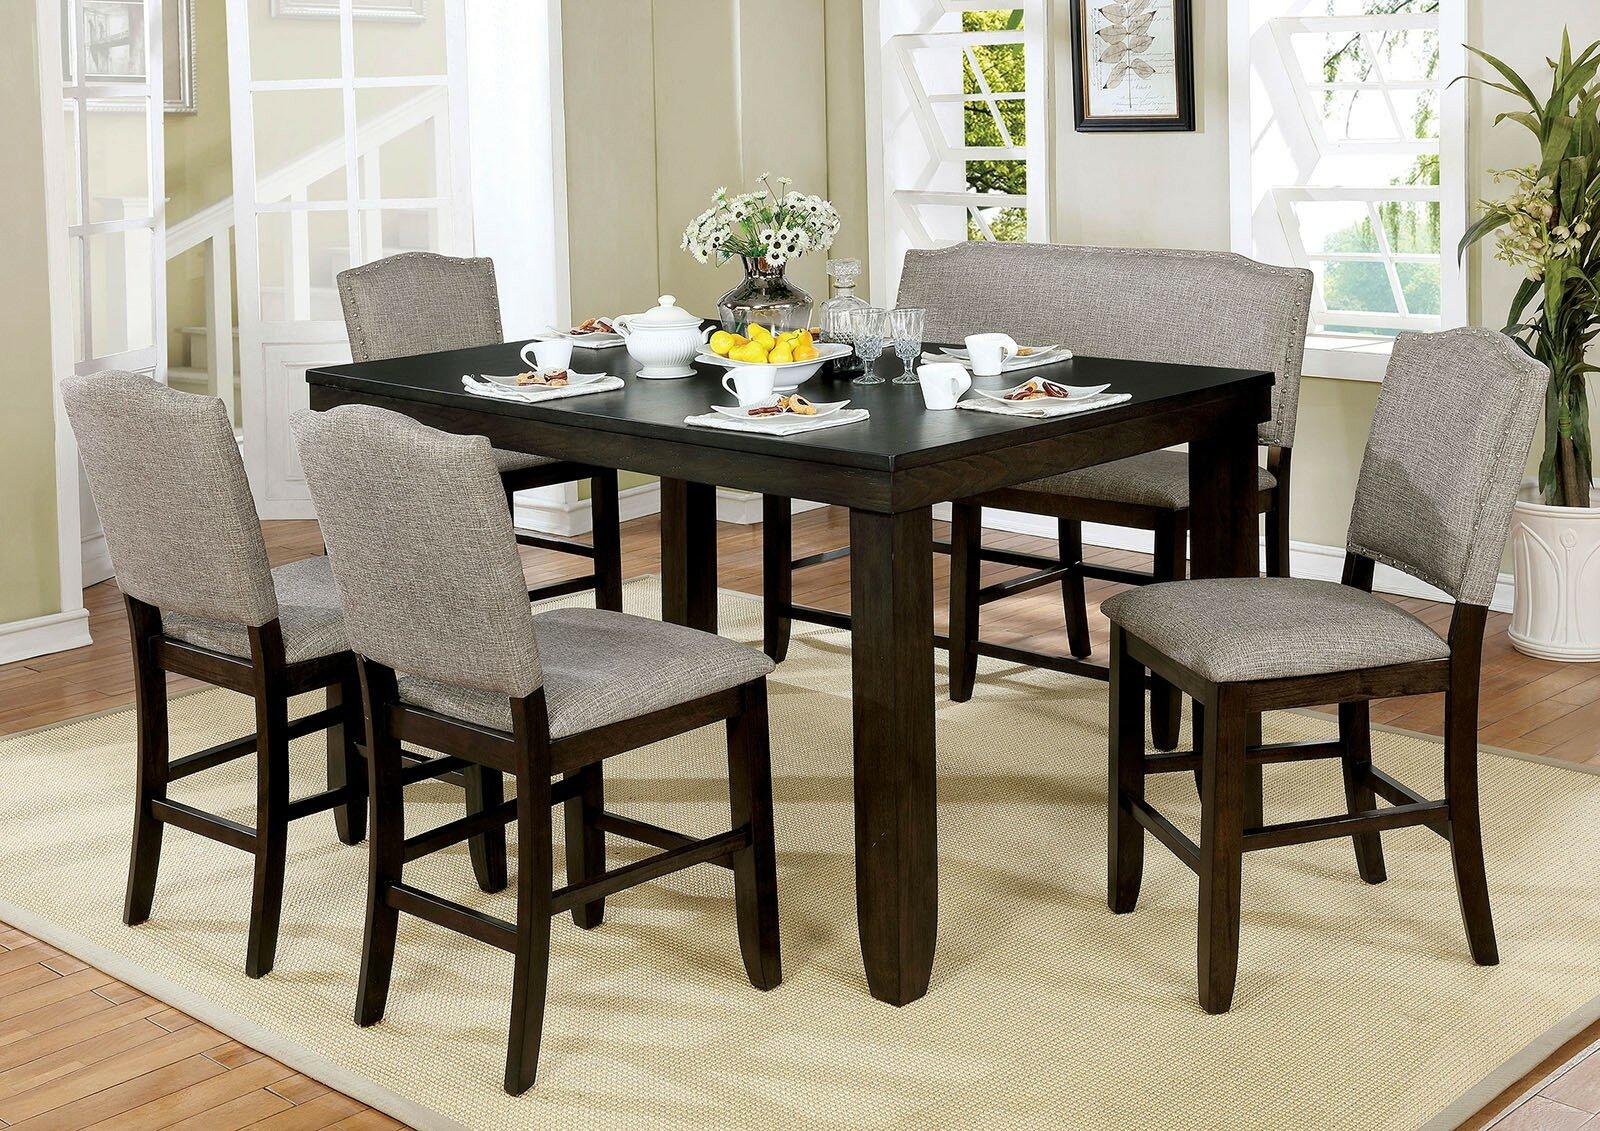 Canora Grey Len 6 Piece Drop Leaf Breakfast Nook Dining Set | Wayfair